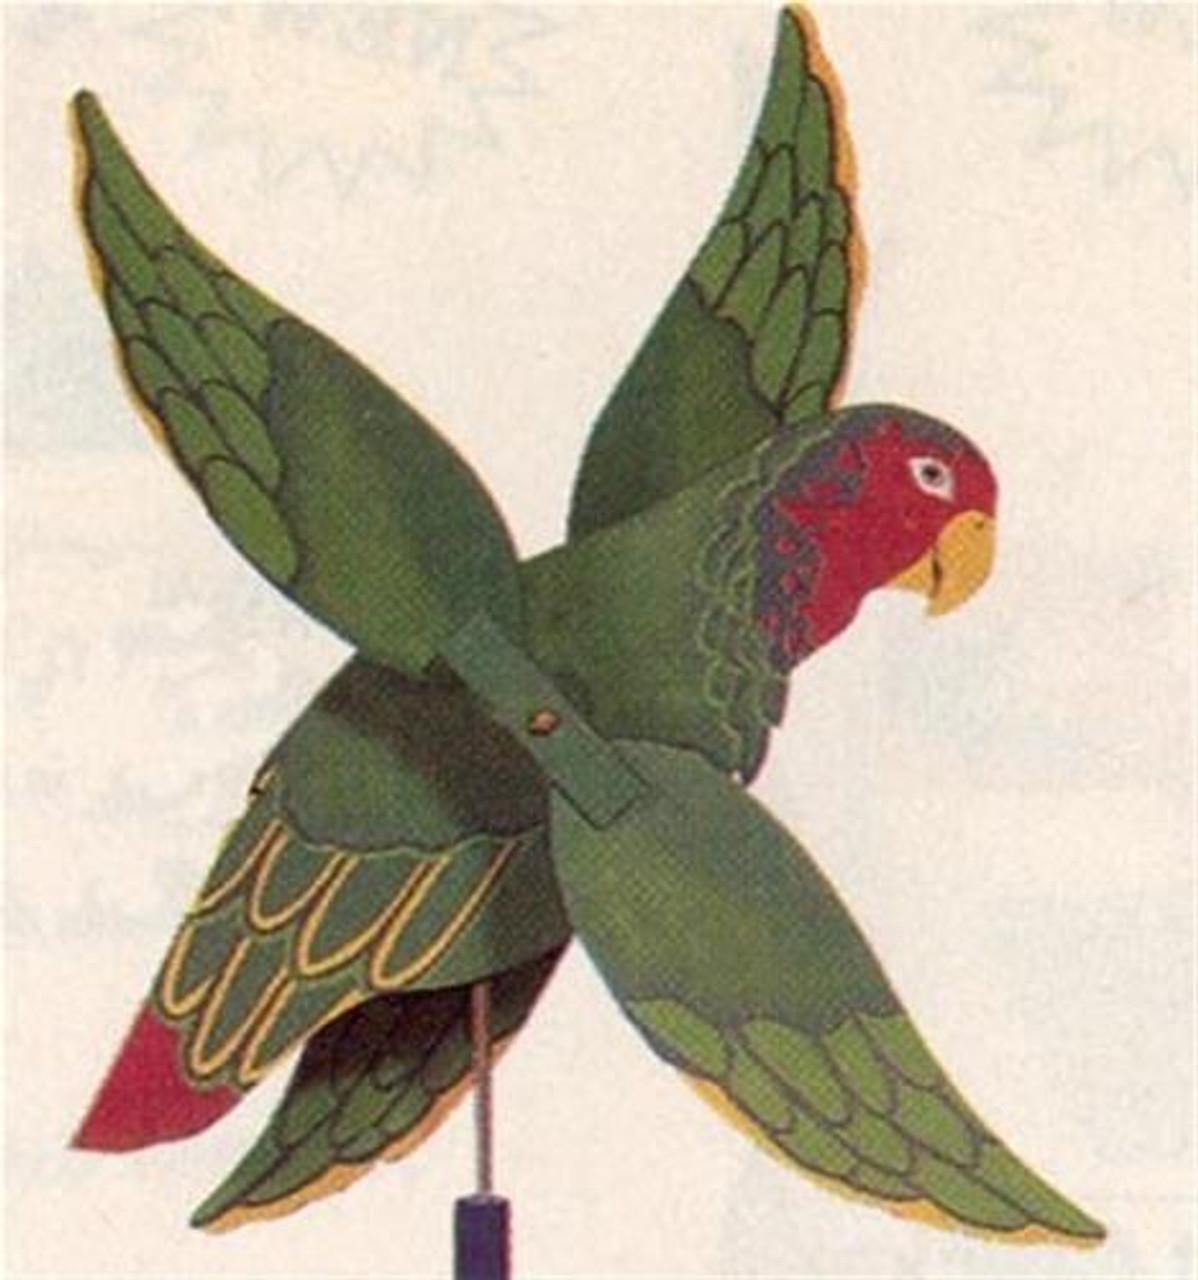 Cherry Tree Toys Green Parrot Whirligig